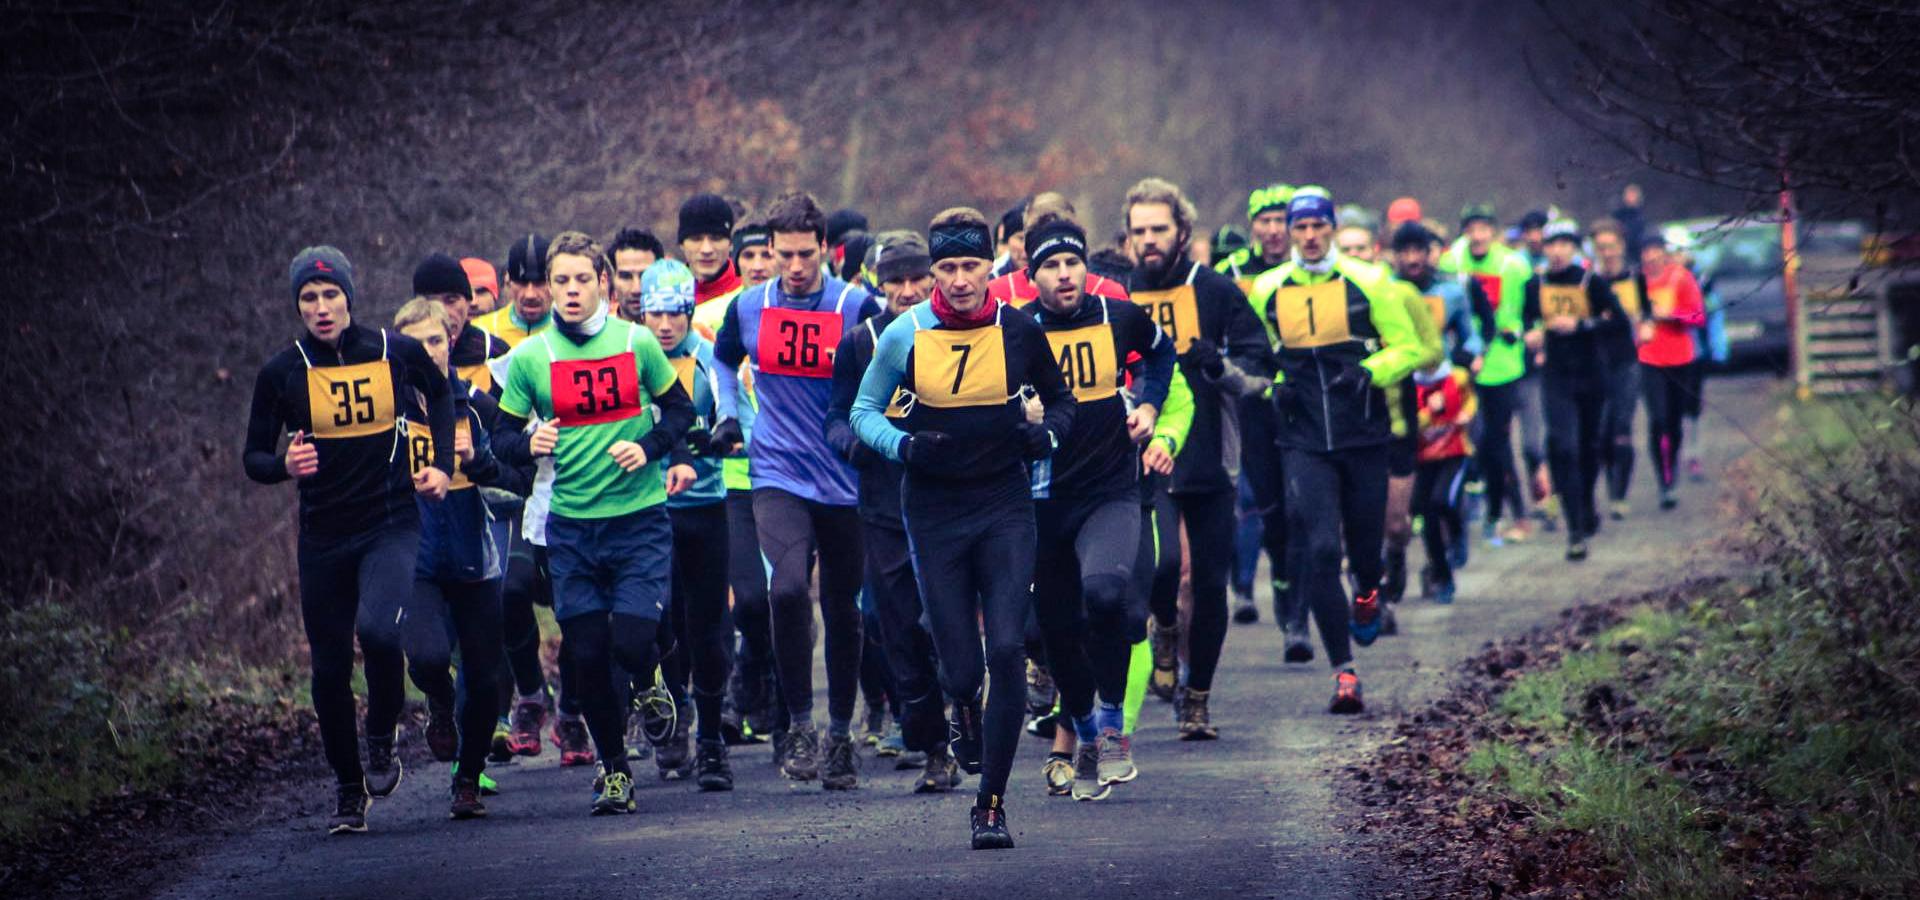 PERUN RUN - to pravé pro běžce!